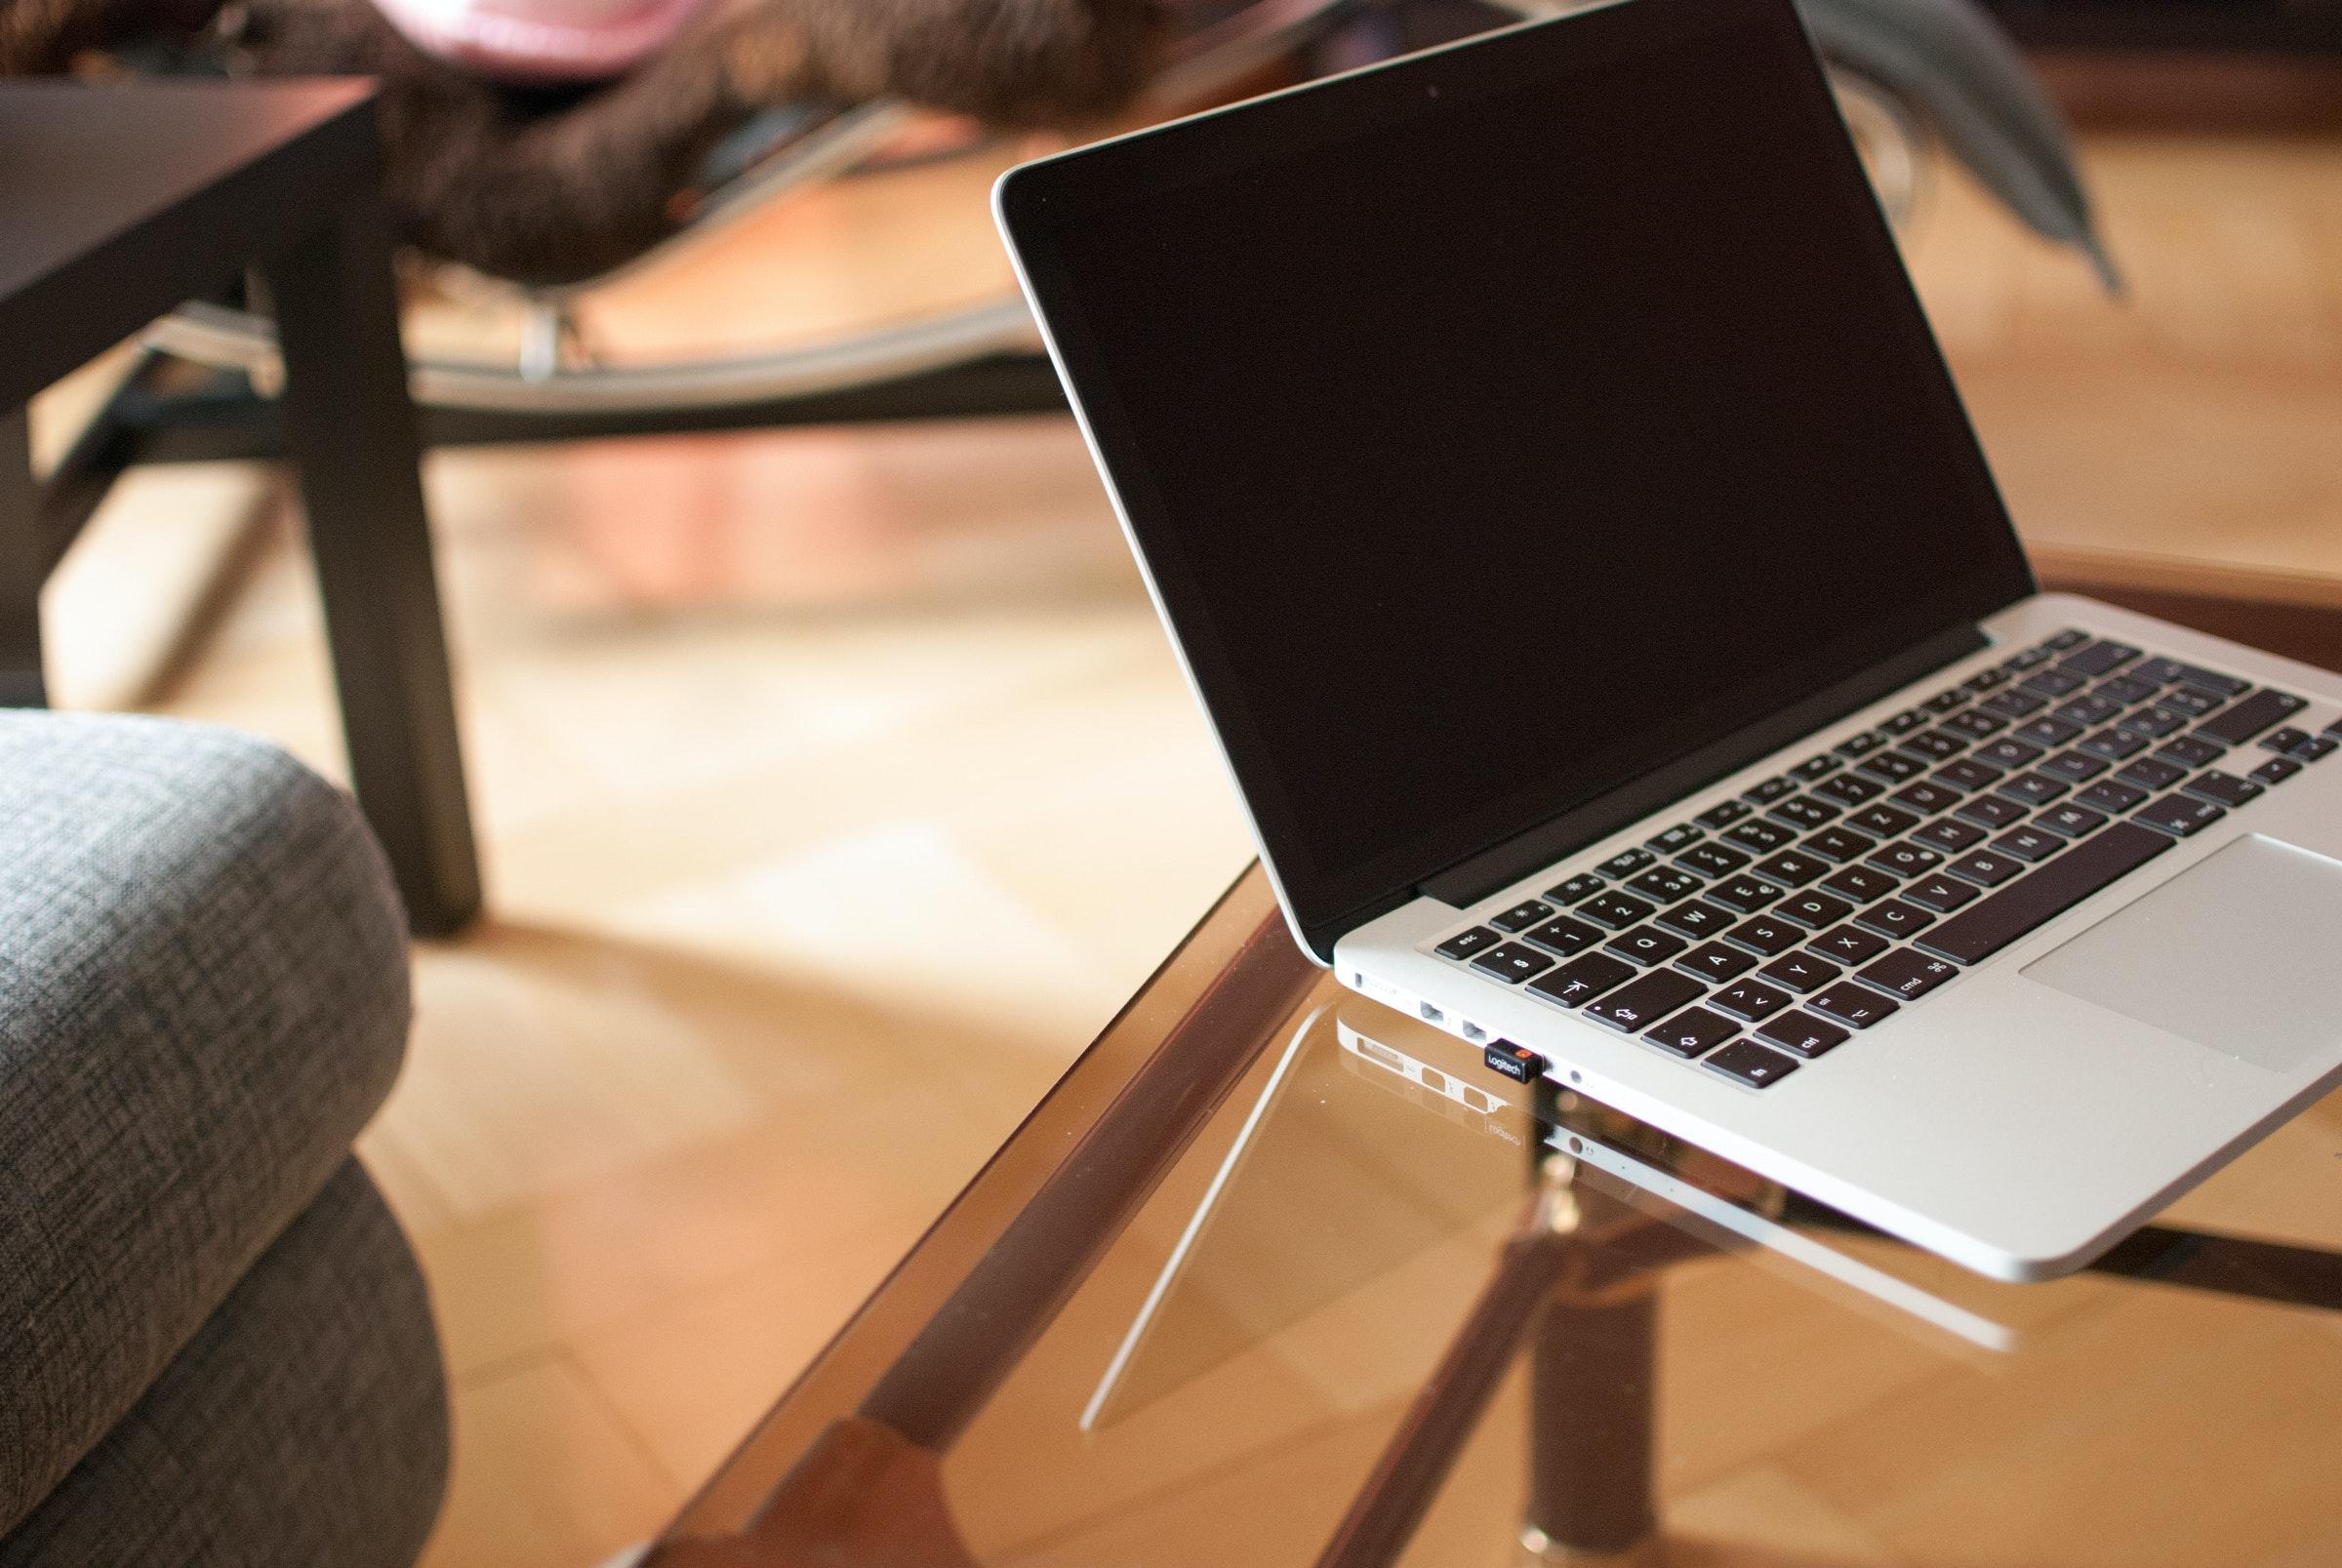 macbook pro with black screen beside notebook on brown. Black Bedroom Furniture Sets. Home Design Ideas